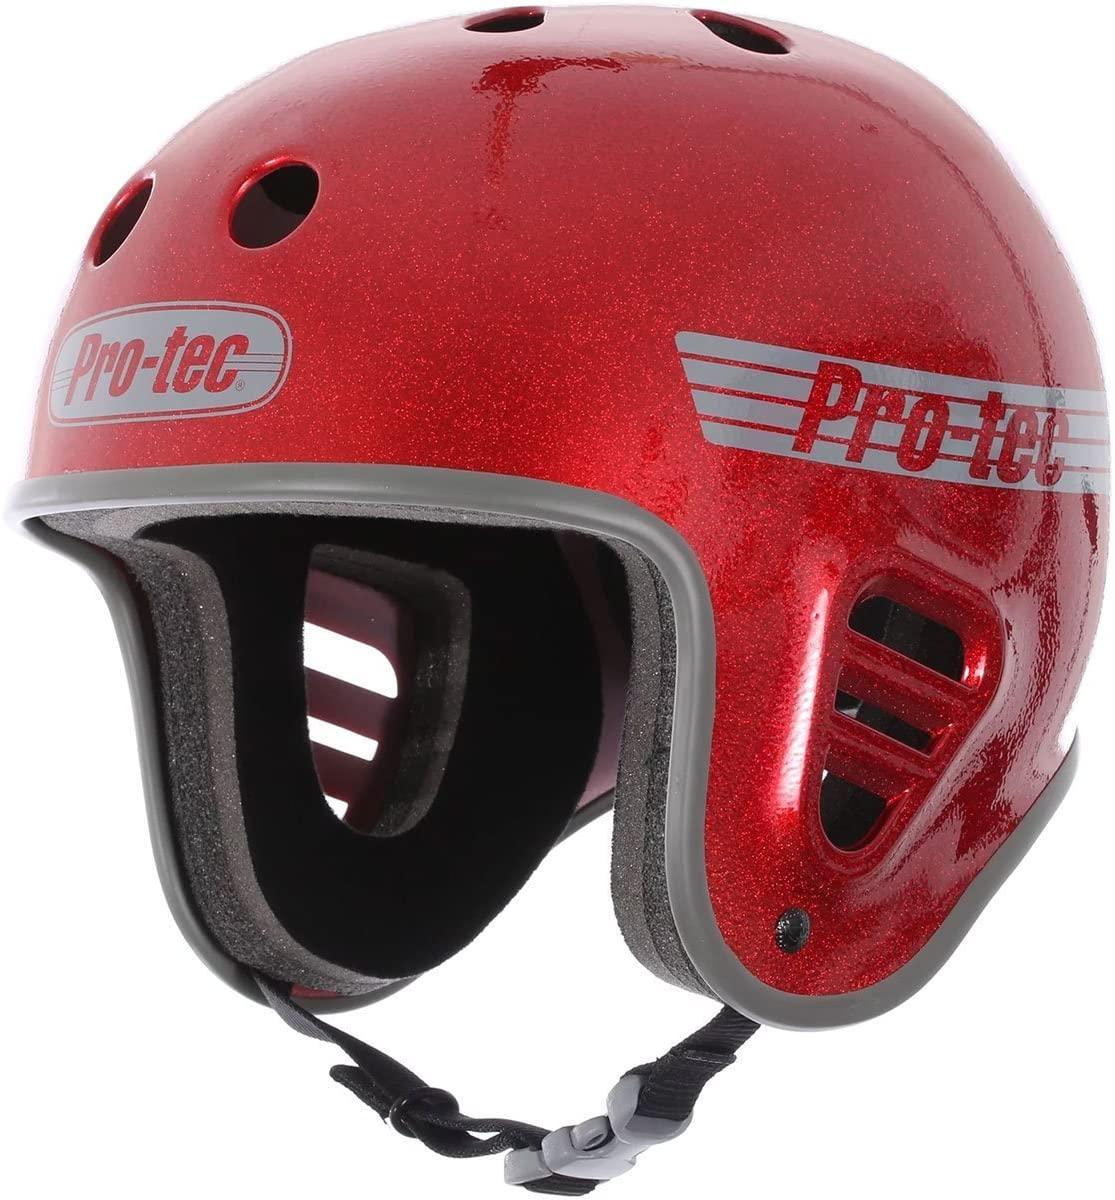 Pro Tec Full Cut Skate Helmet - Red Metal Flake - SM